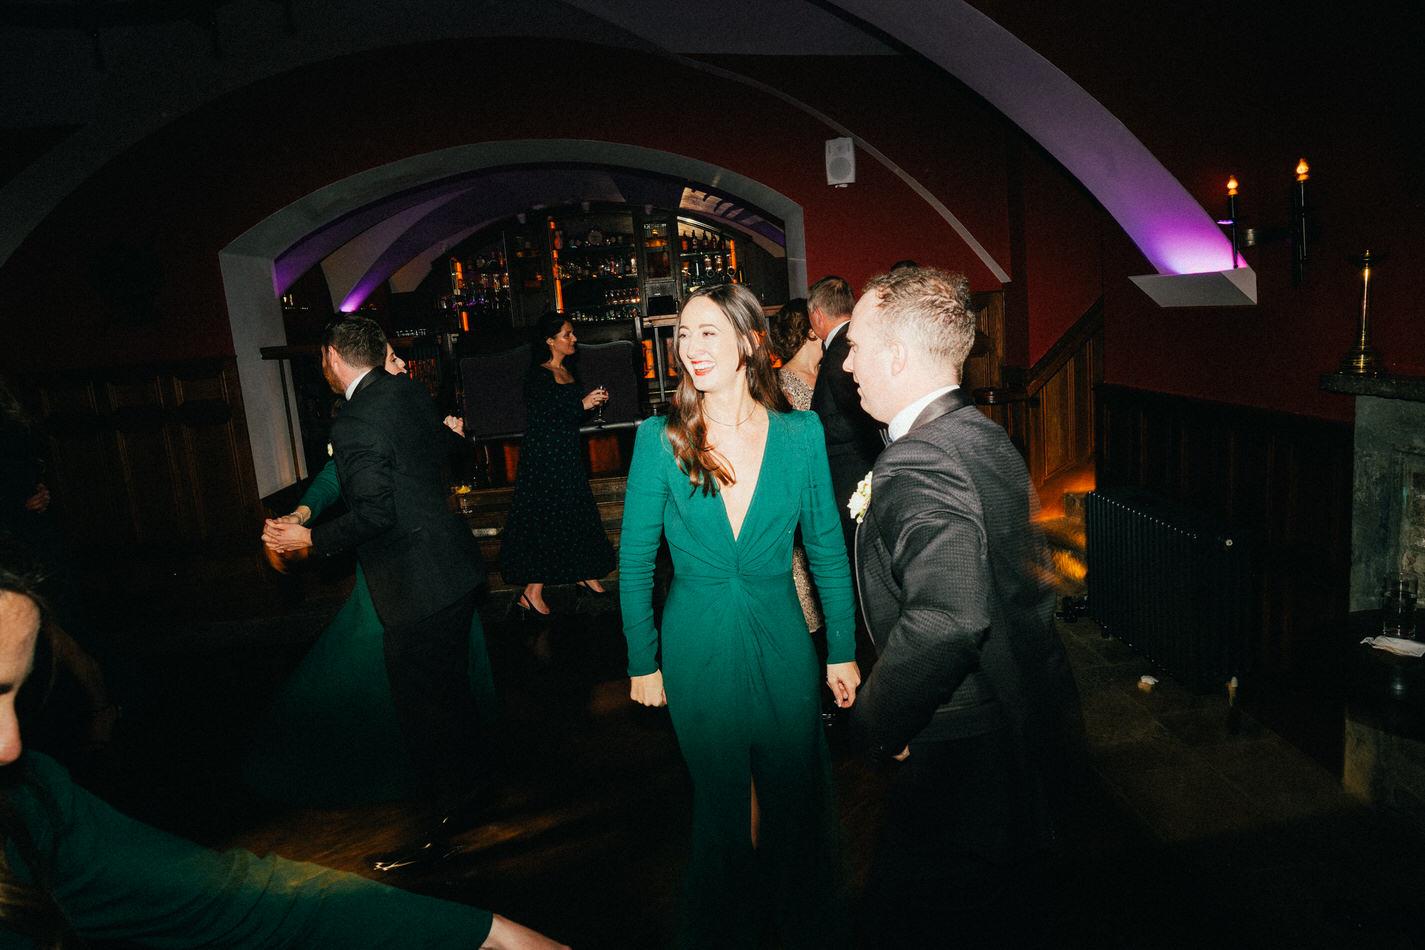 Castle-wedding-ireland-photos- 0336 248